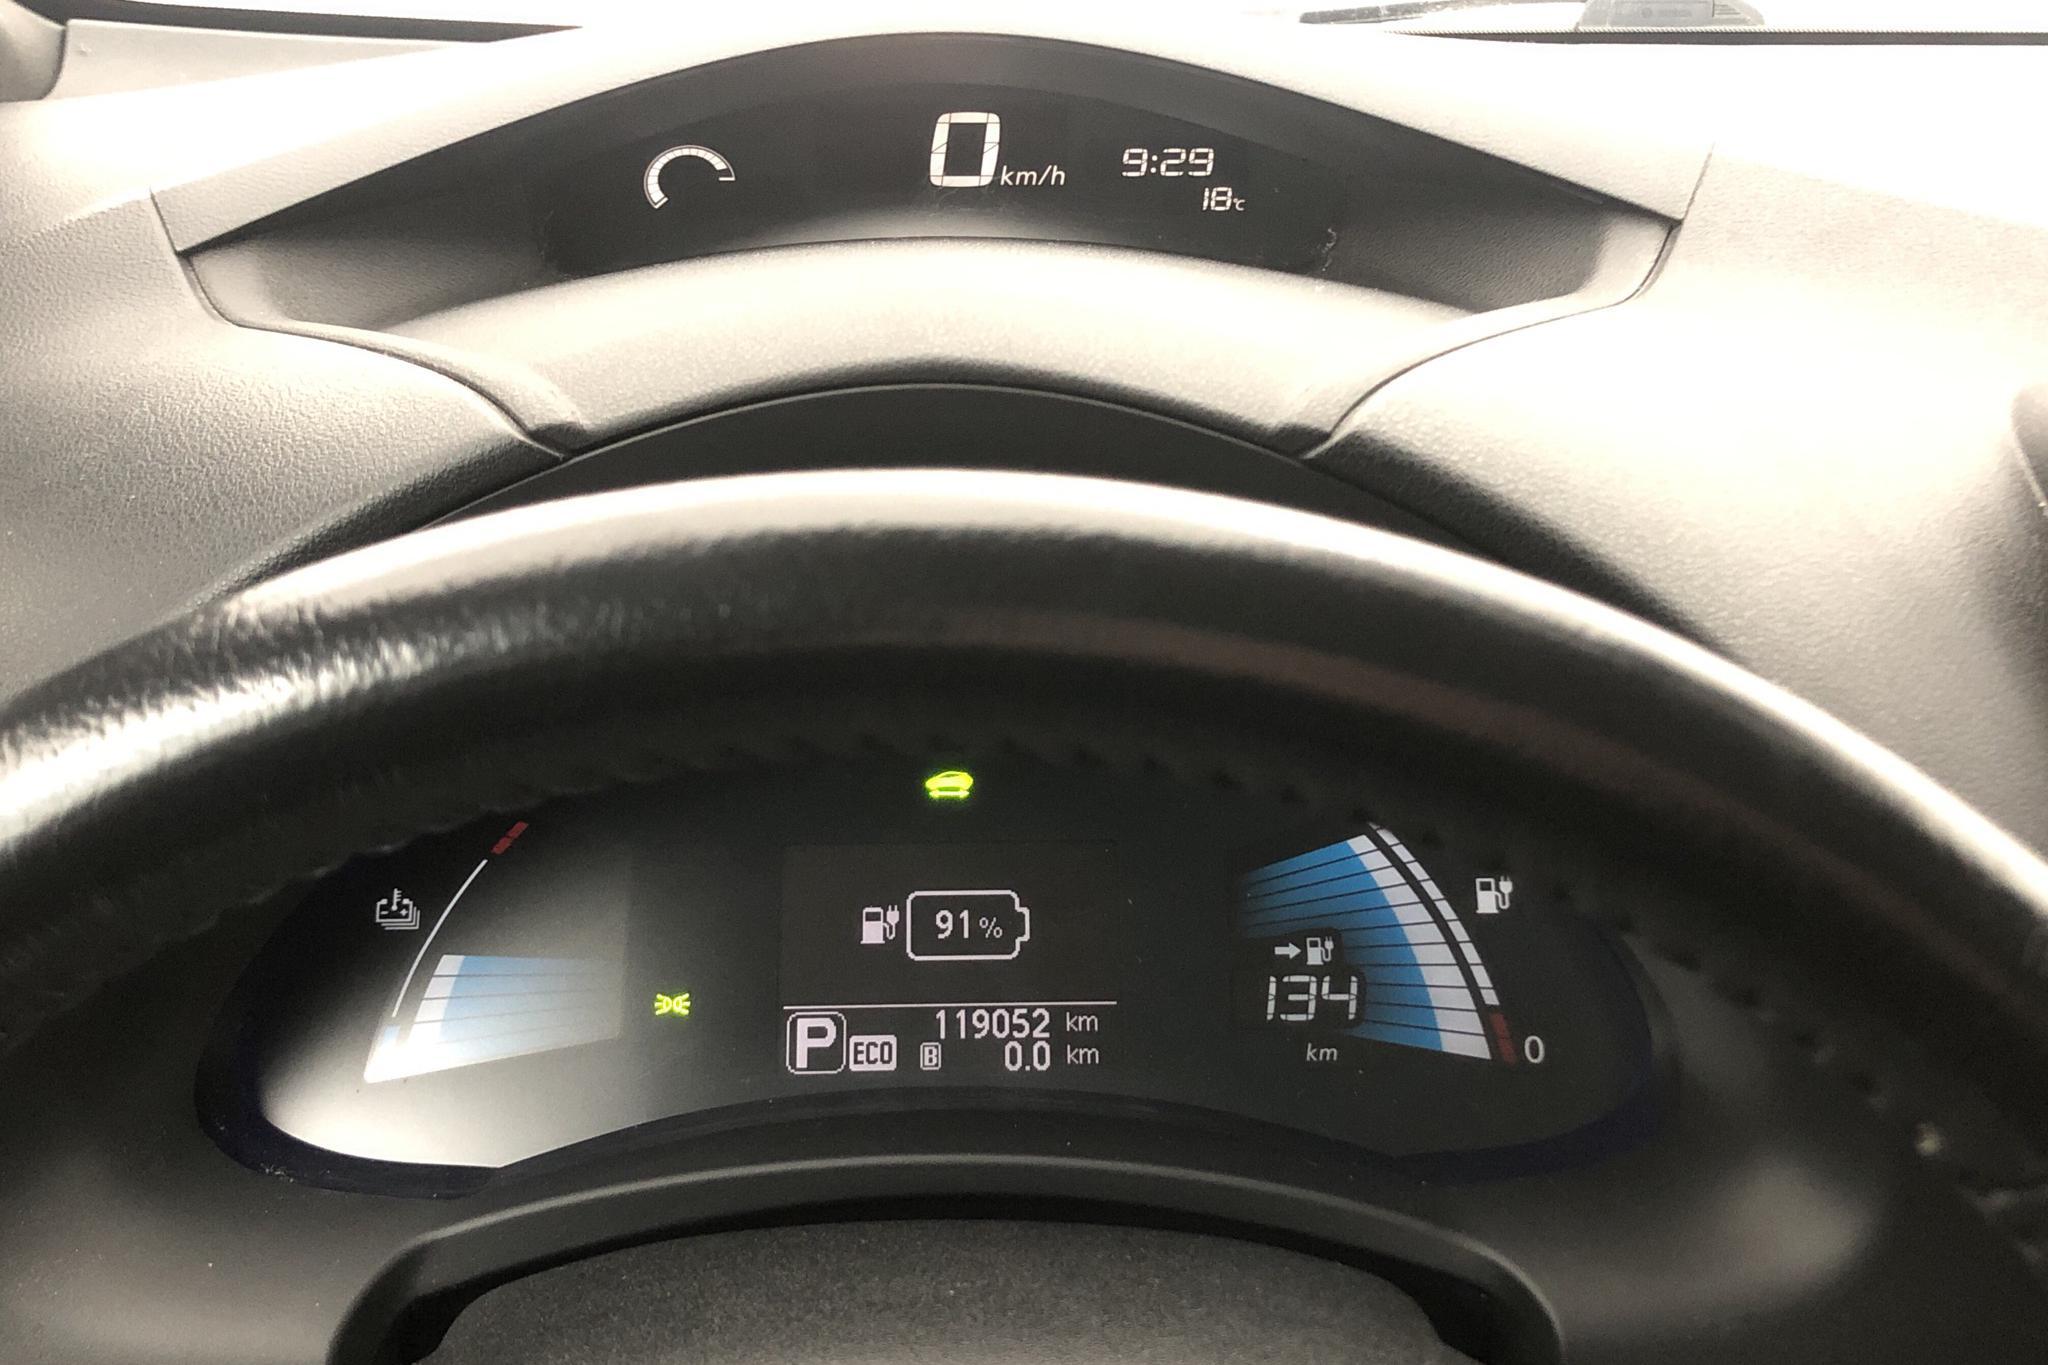 Nissan LEAF 5dr (109hk) - 119 050 km - Automatic - black - 2015